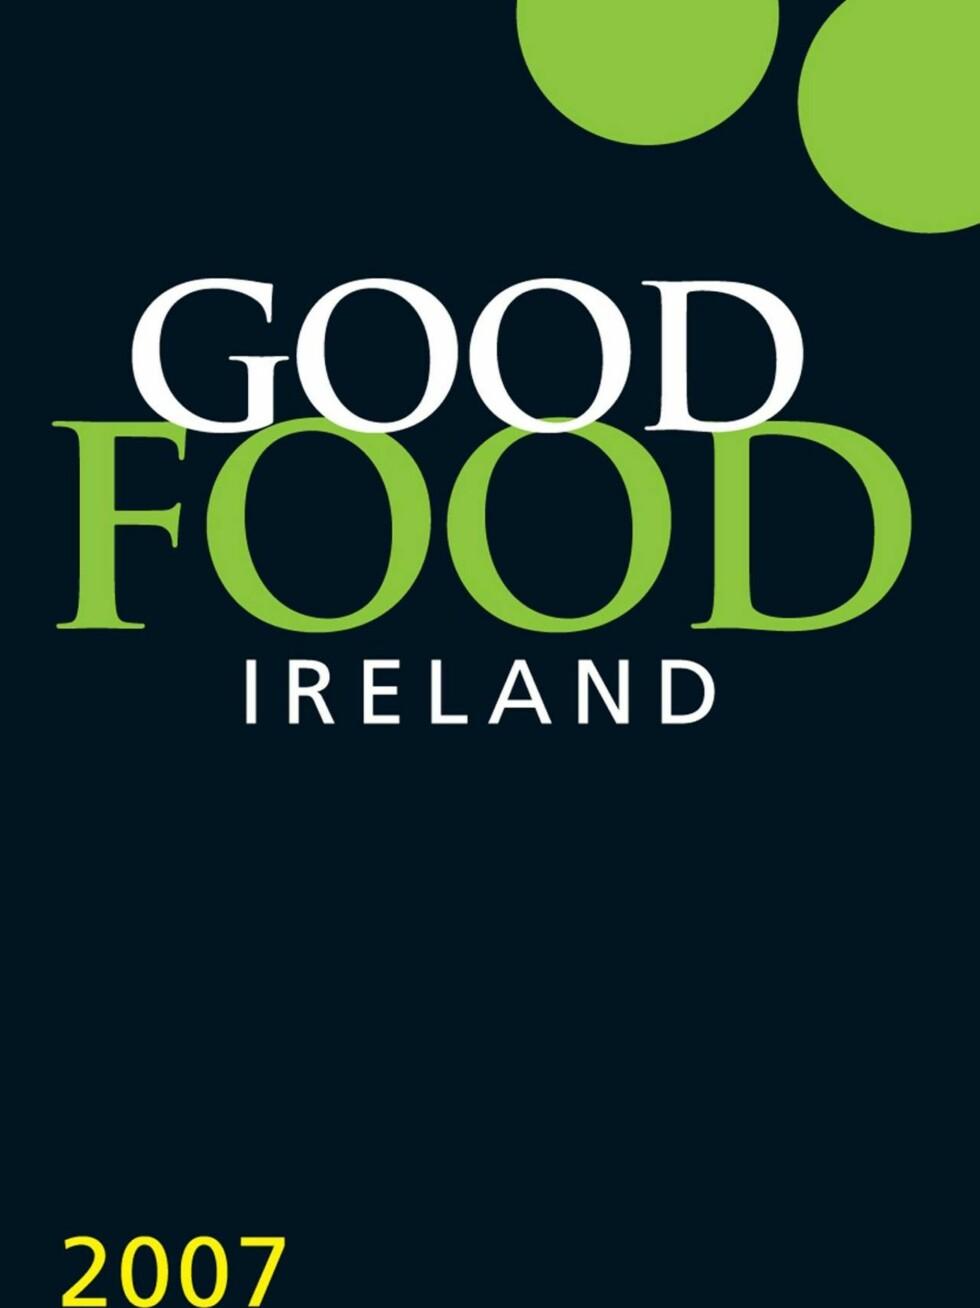 """BIBEL"": Slik ser gourmetbrosjyren til irene ut. Foto: Good Food Ireland"